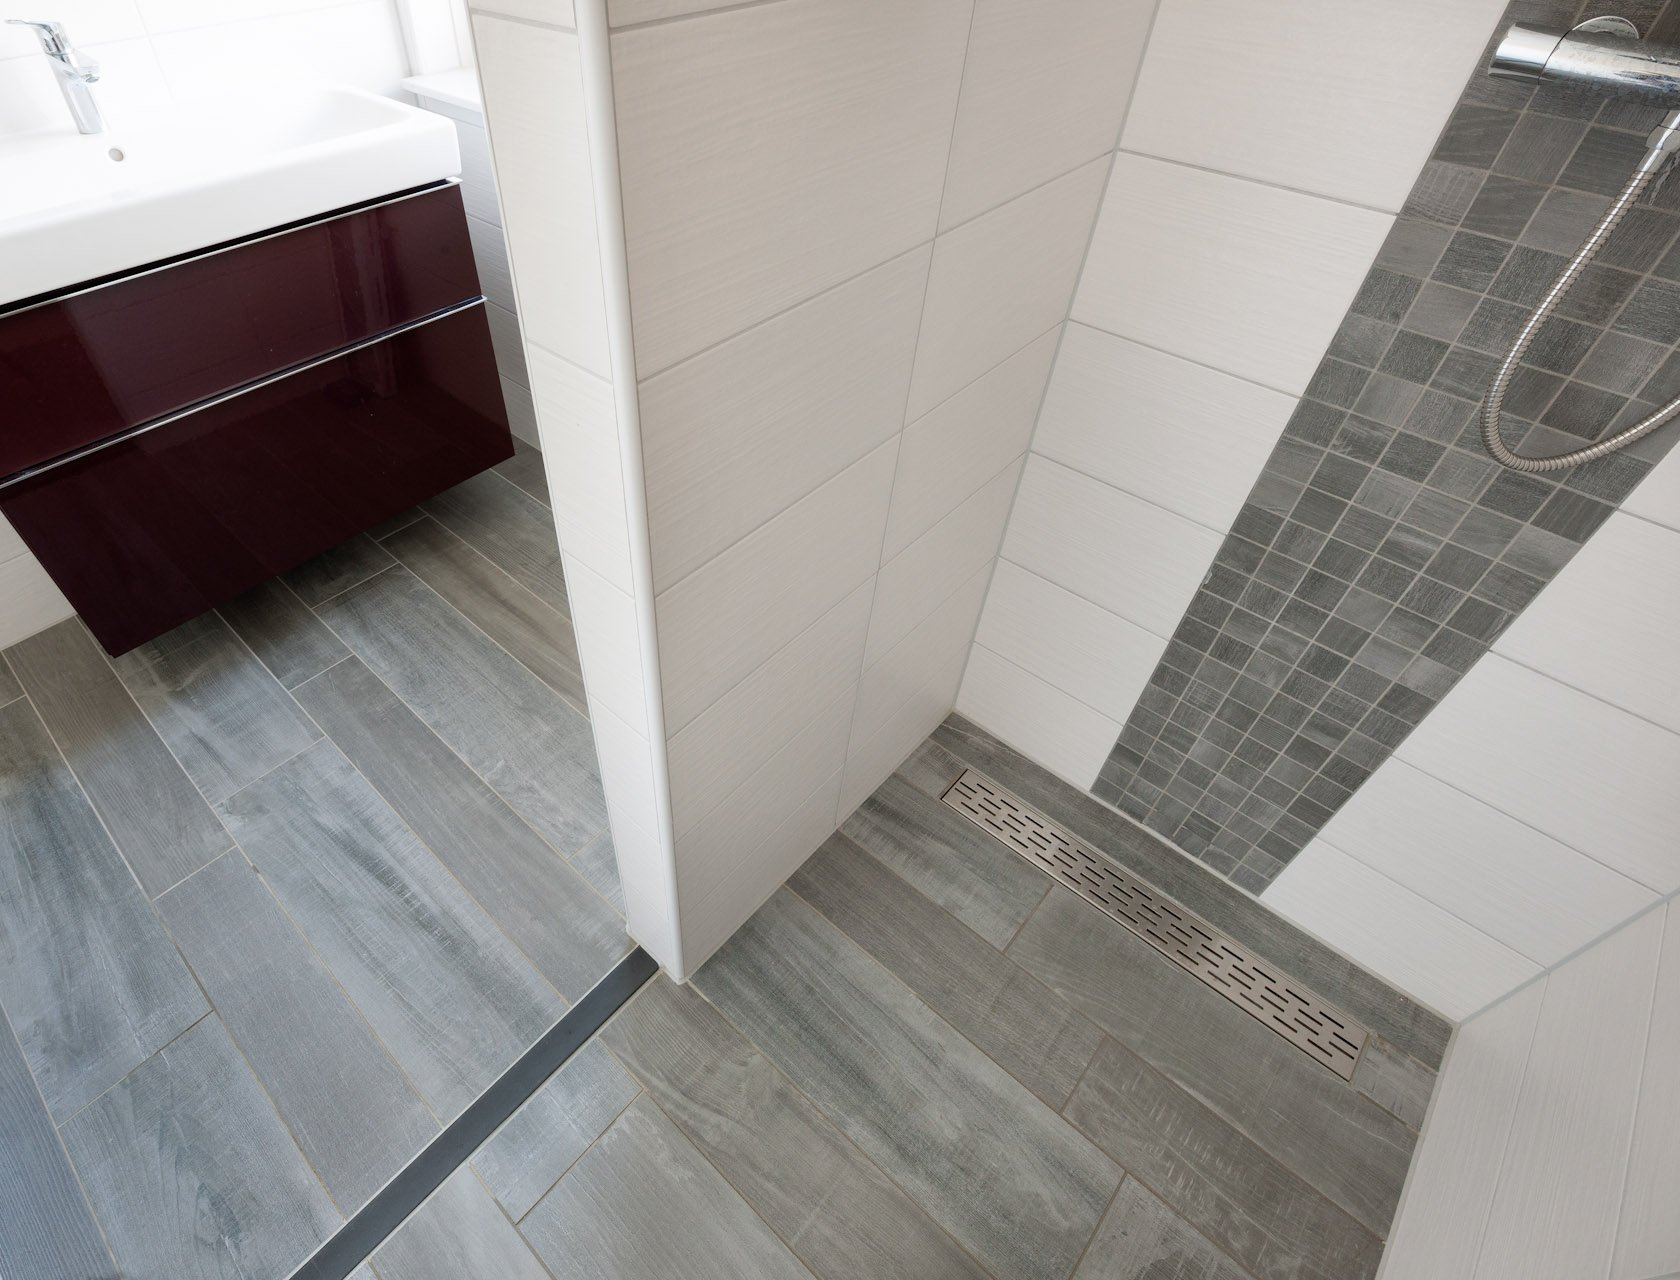 Badkamertegels Natuursteen Mozaiek : Houtlook tegels in woonkamer en ...